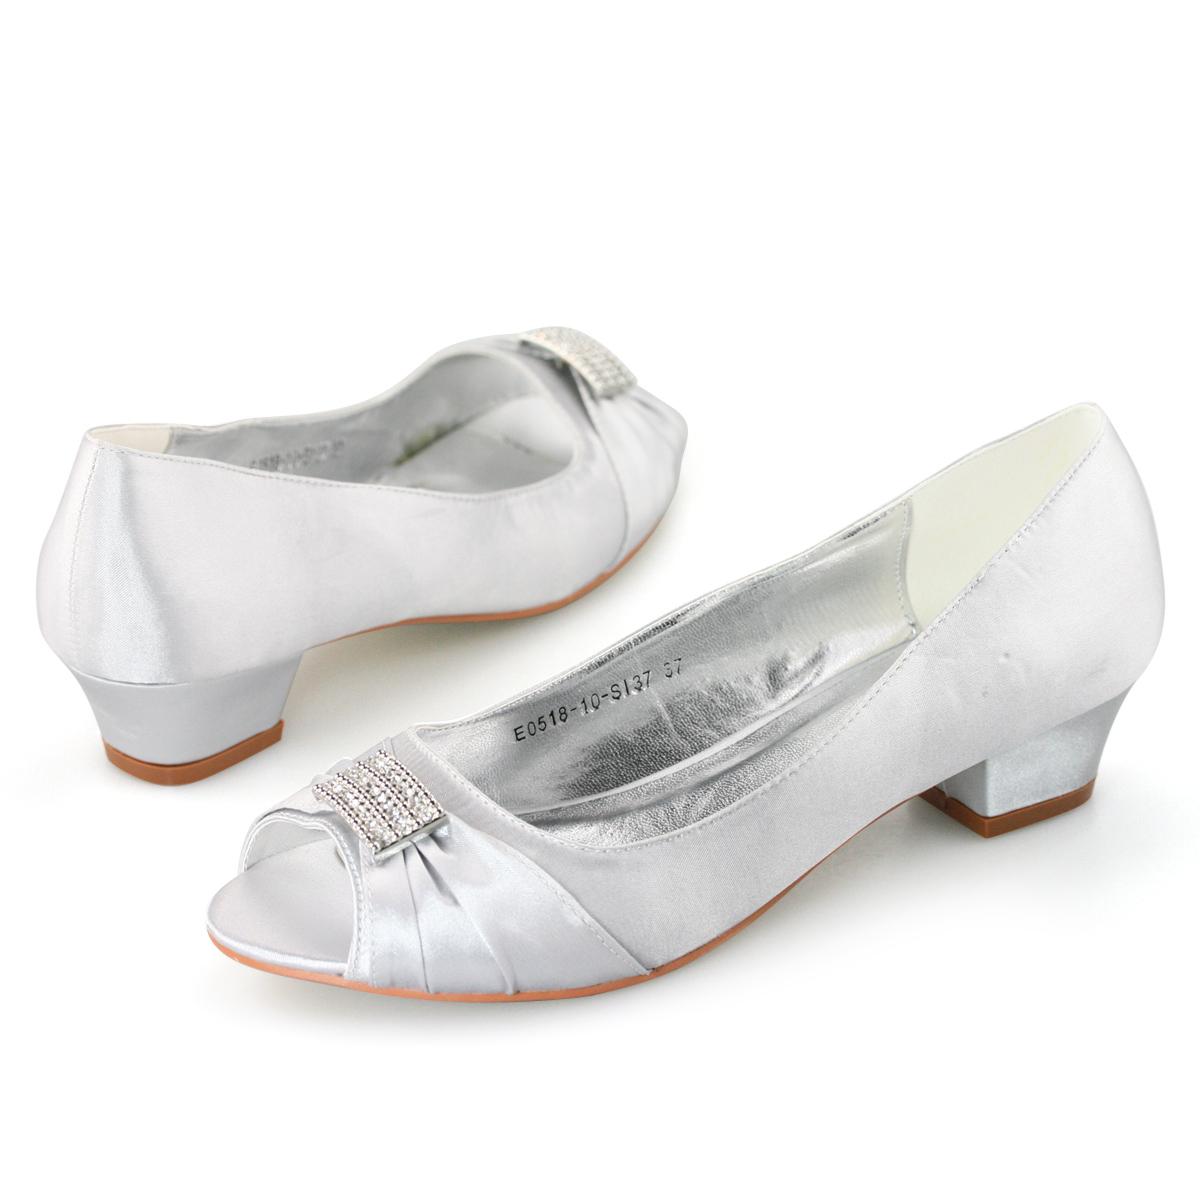 Ladies Silver Satin Diamante Peep Toe Low Heels Evening Dress Wedding Shoes Sz